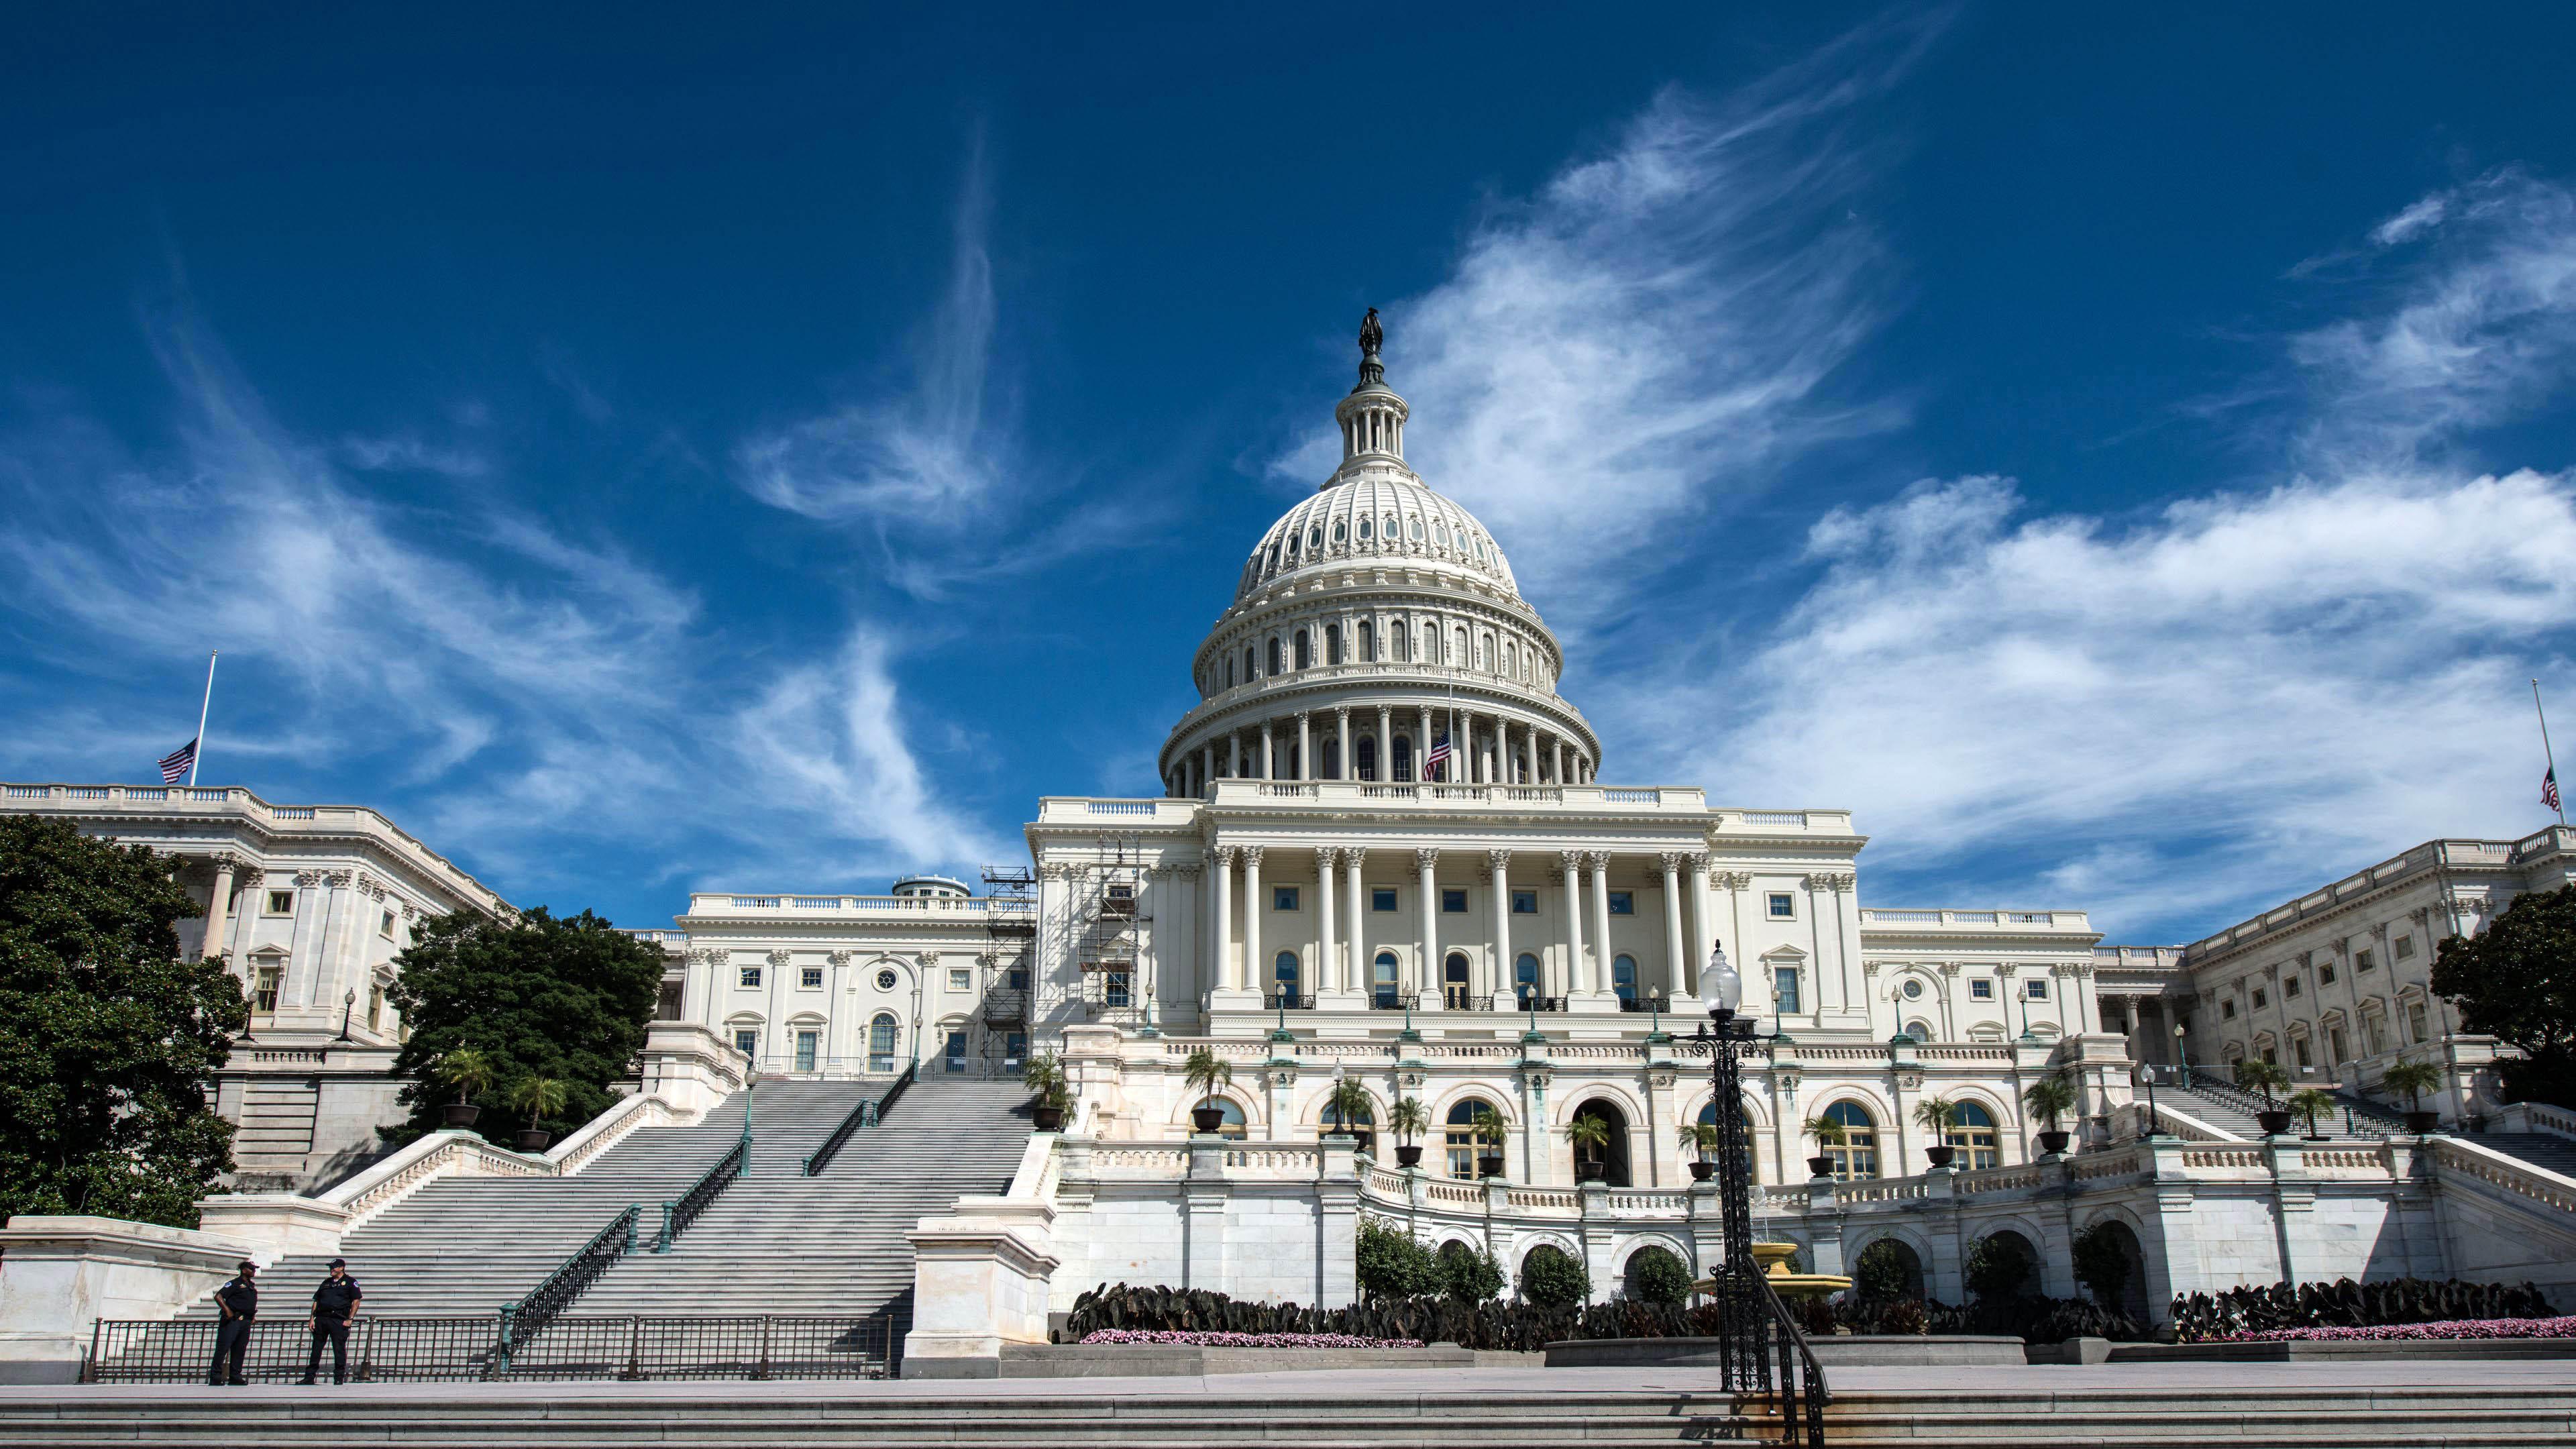 United States Capitol Wallpaper 6   3840 X 2160 stmednet 3840x2160